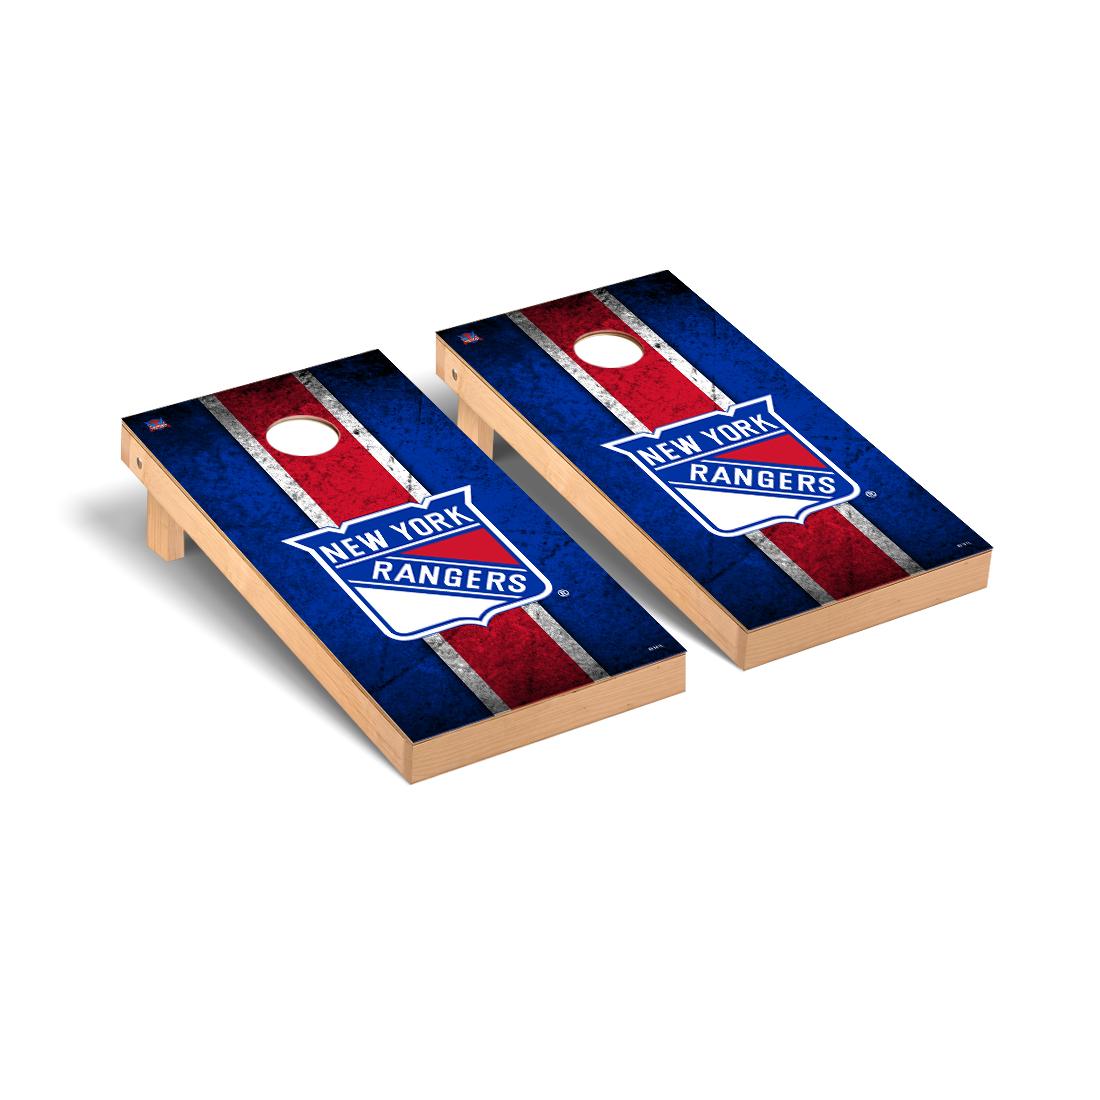 New York Rangers NHL Cornhole Game Set Vintage Version